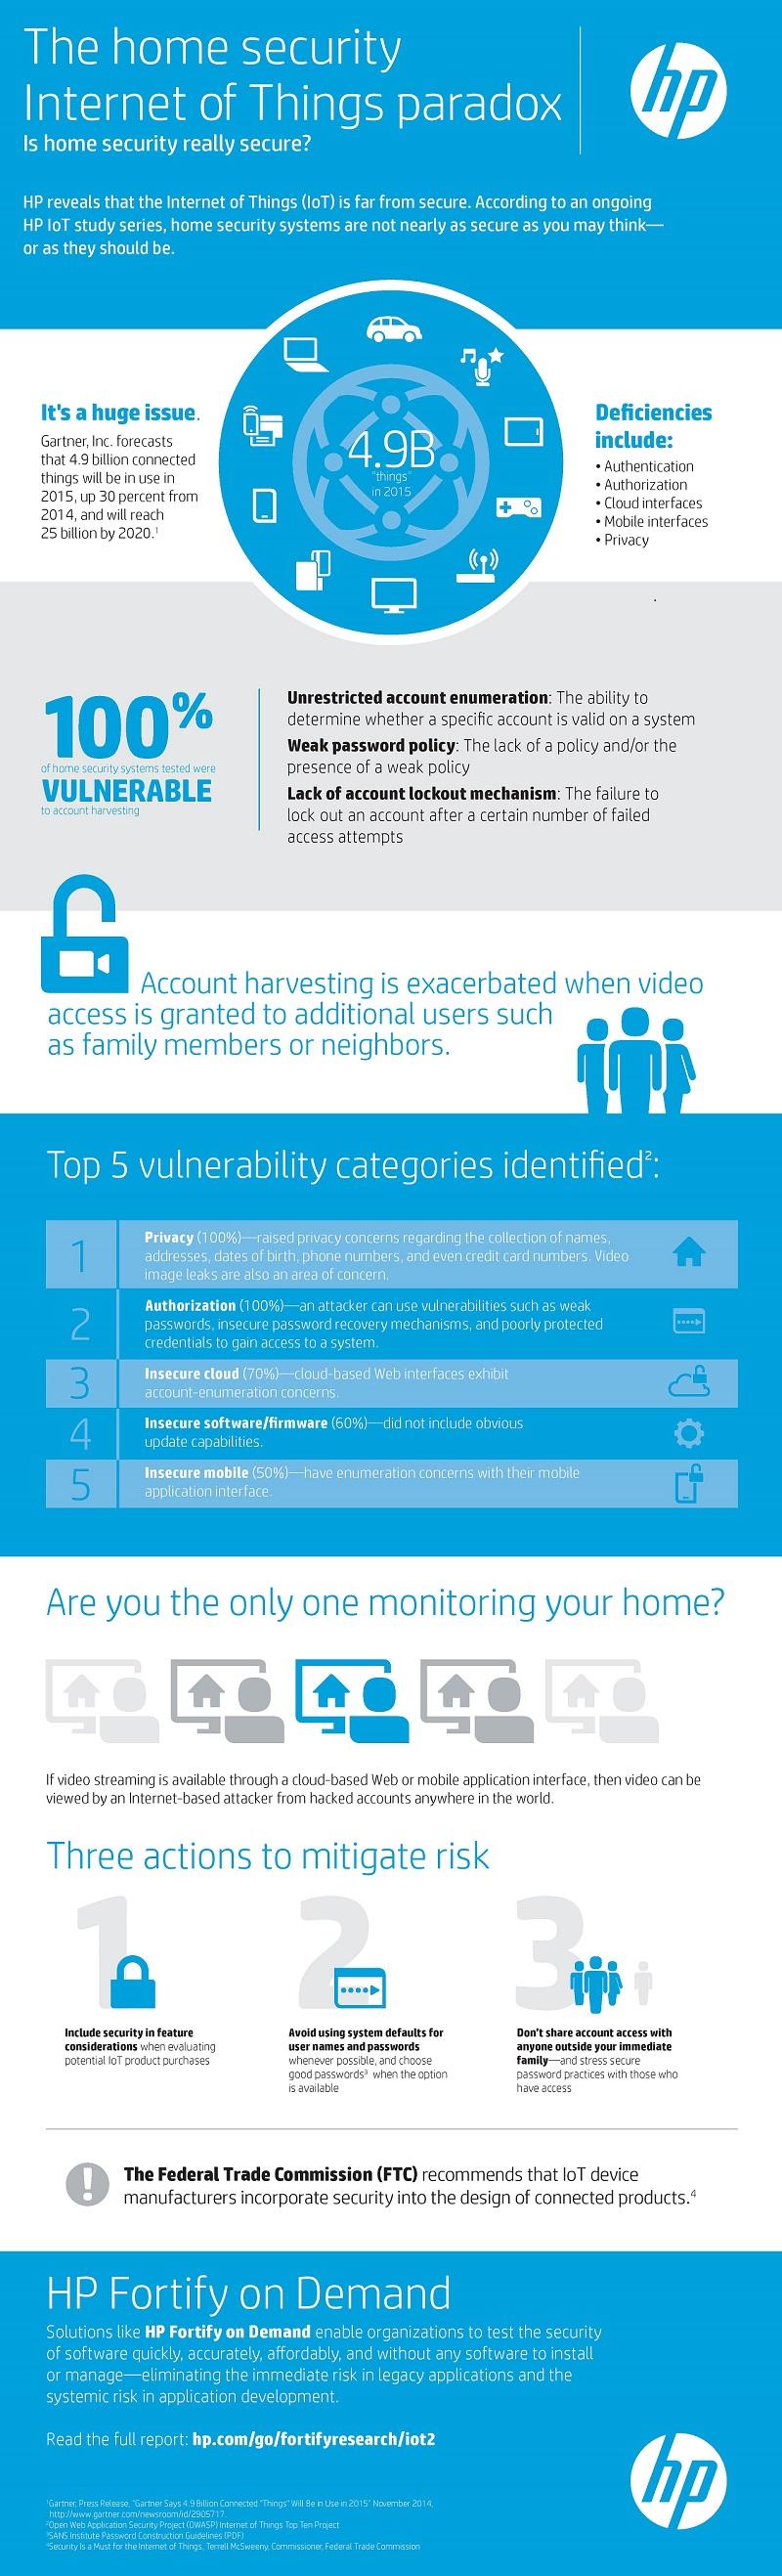 InternetofThings_infographic